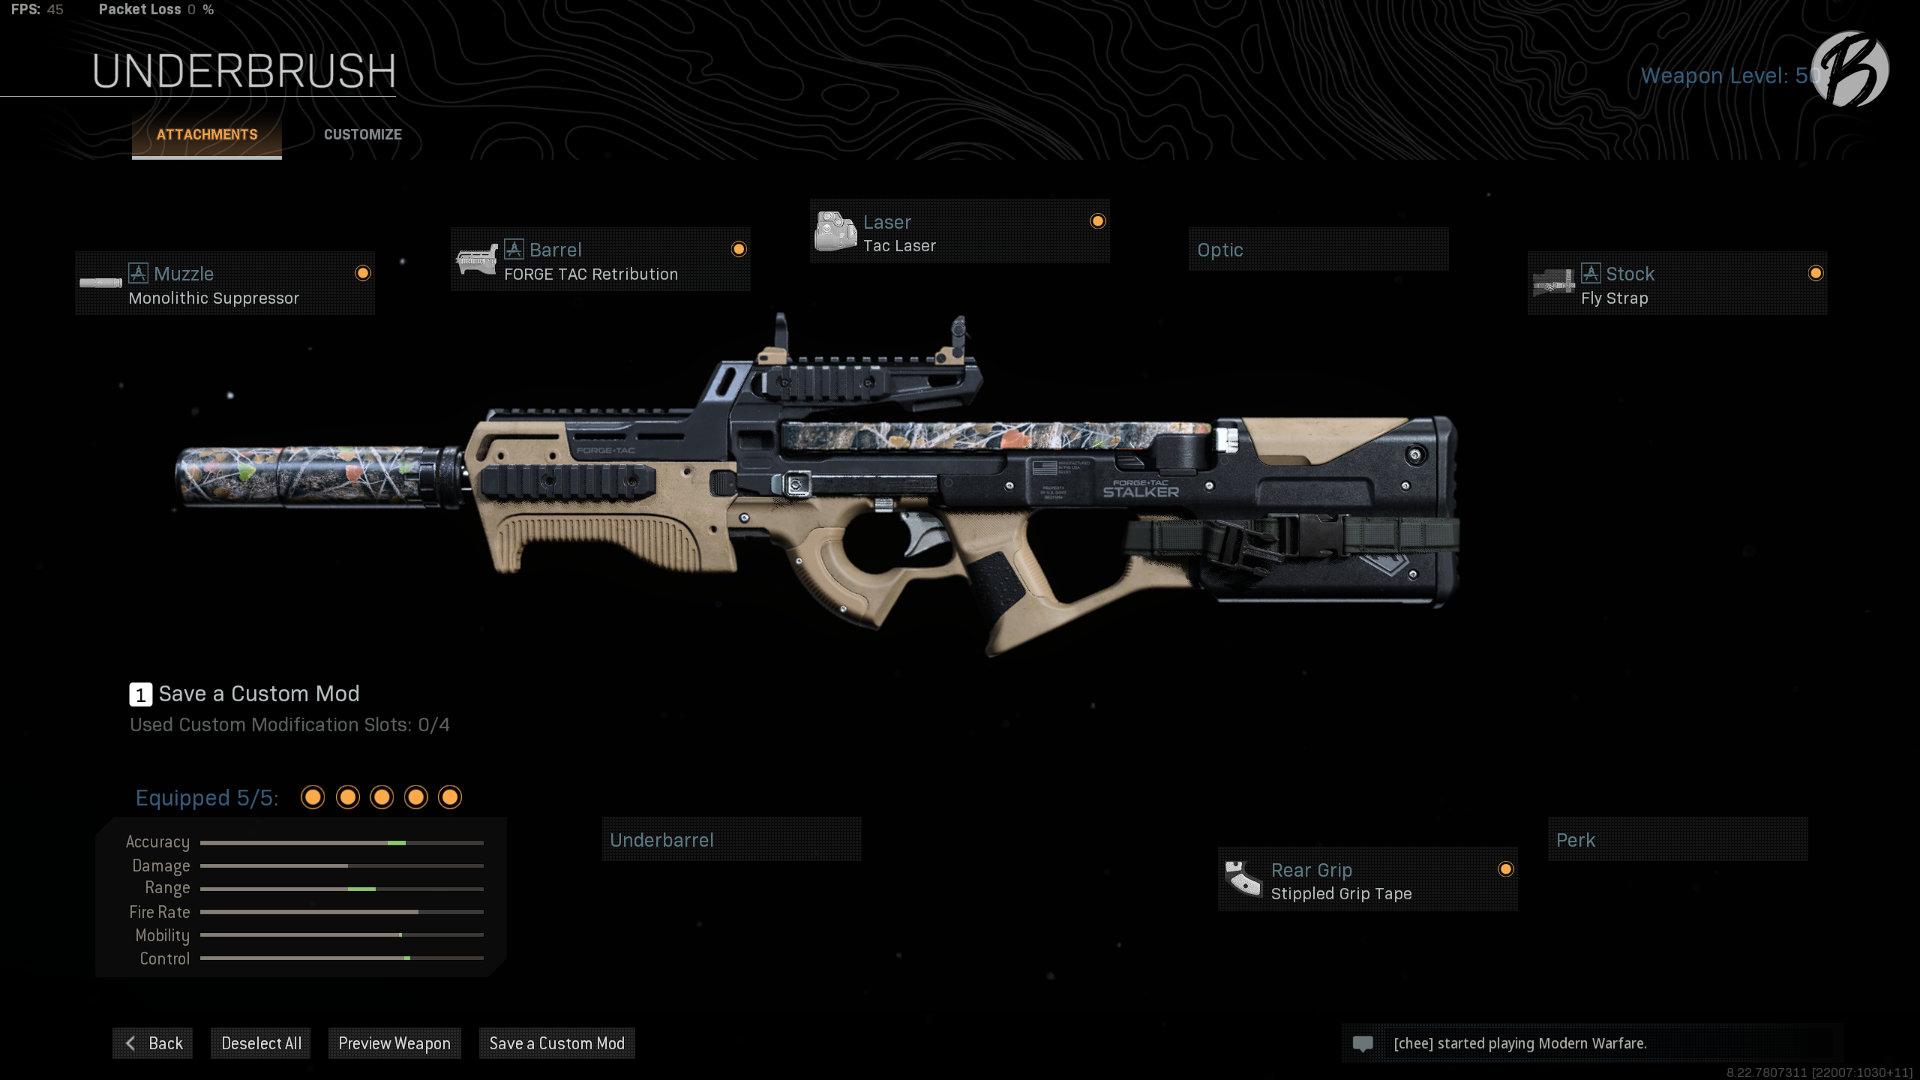 P90: Monolithic Suppressor, Forge TAC Retribution, Tac Laser, Fly Strap, Stippled Grip Tape